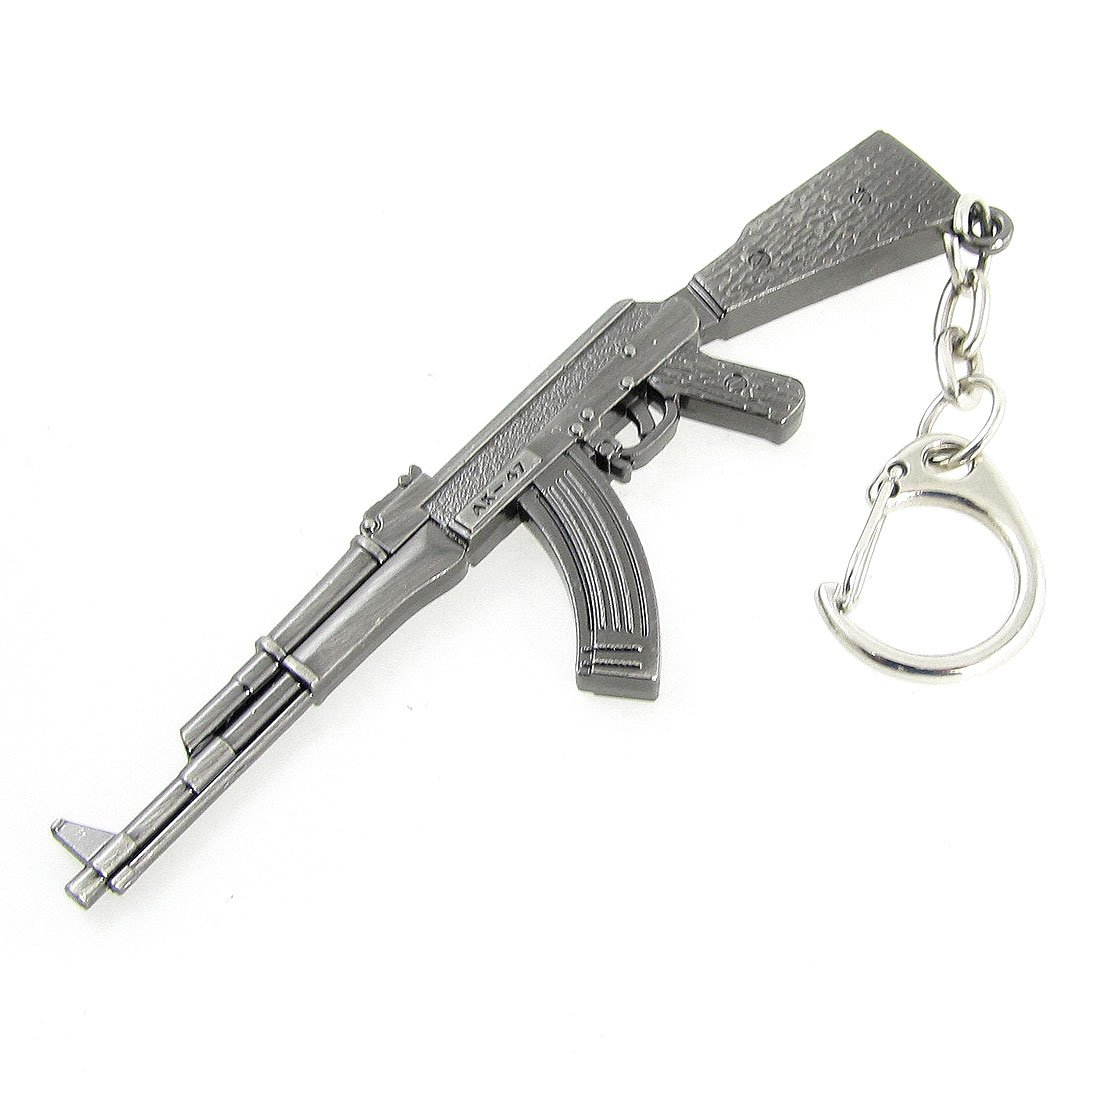 miniature ak 47 fusil pistolet modele homard crochet pendentif porte gris wt. Black Bedroom Furniture Sets. Home Design Ideas